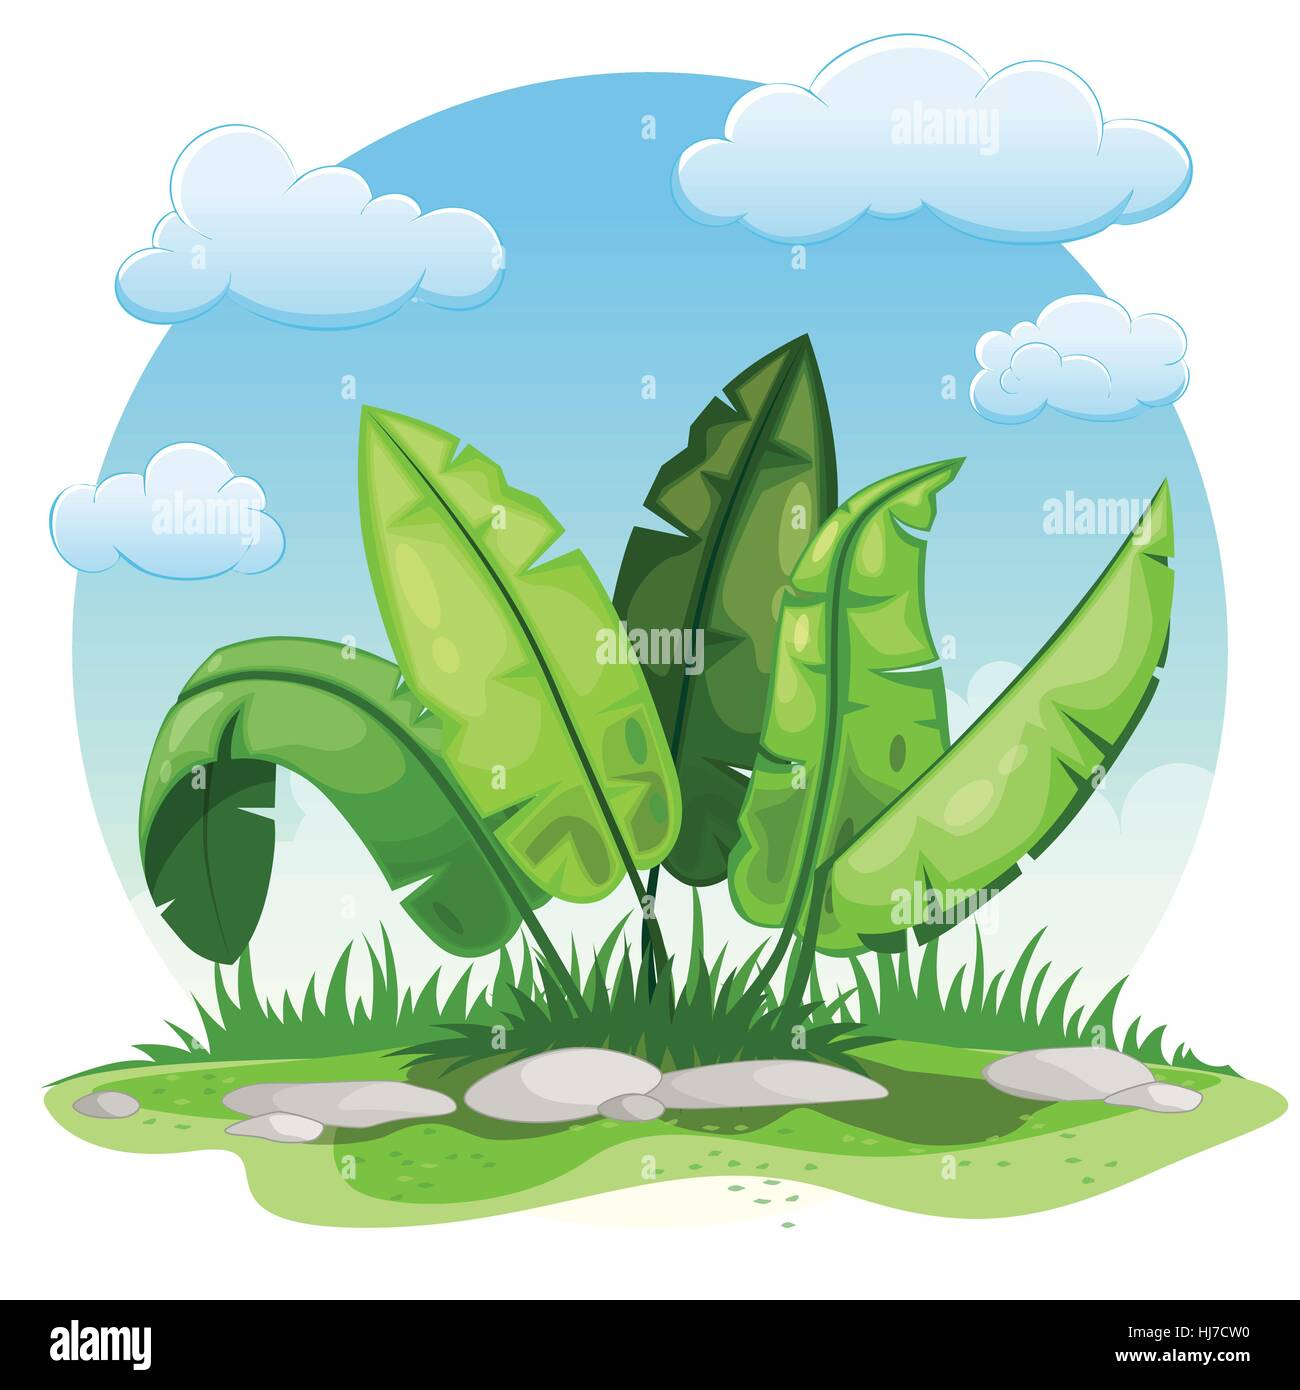 Illustration Of Cartoon Plants Stock Vector Art